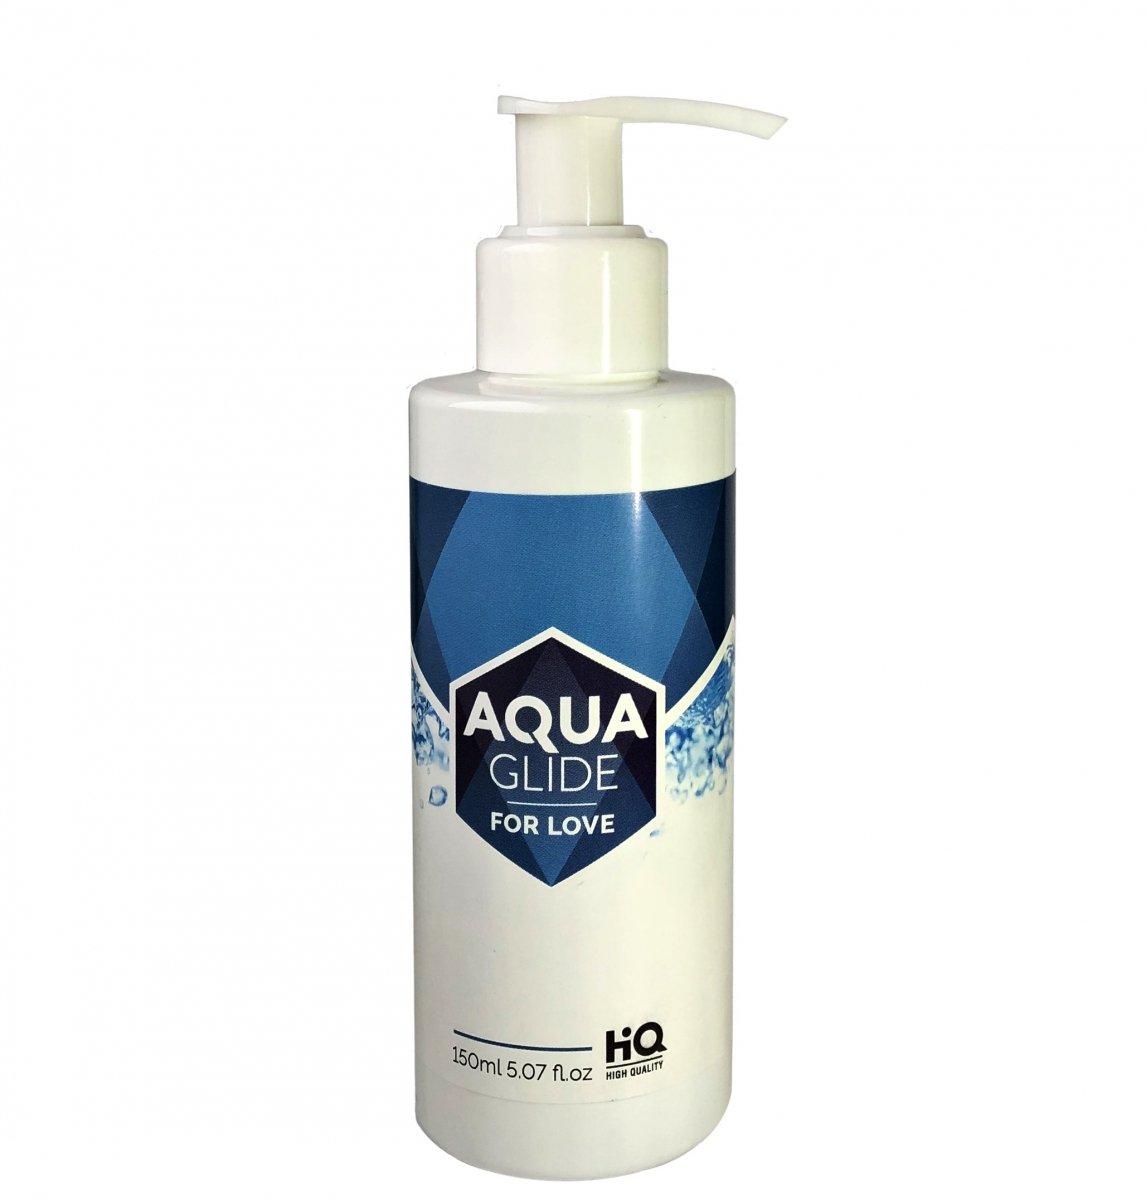 AquaGlide for Love